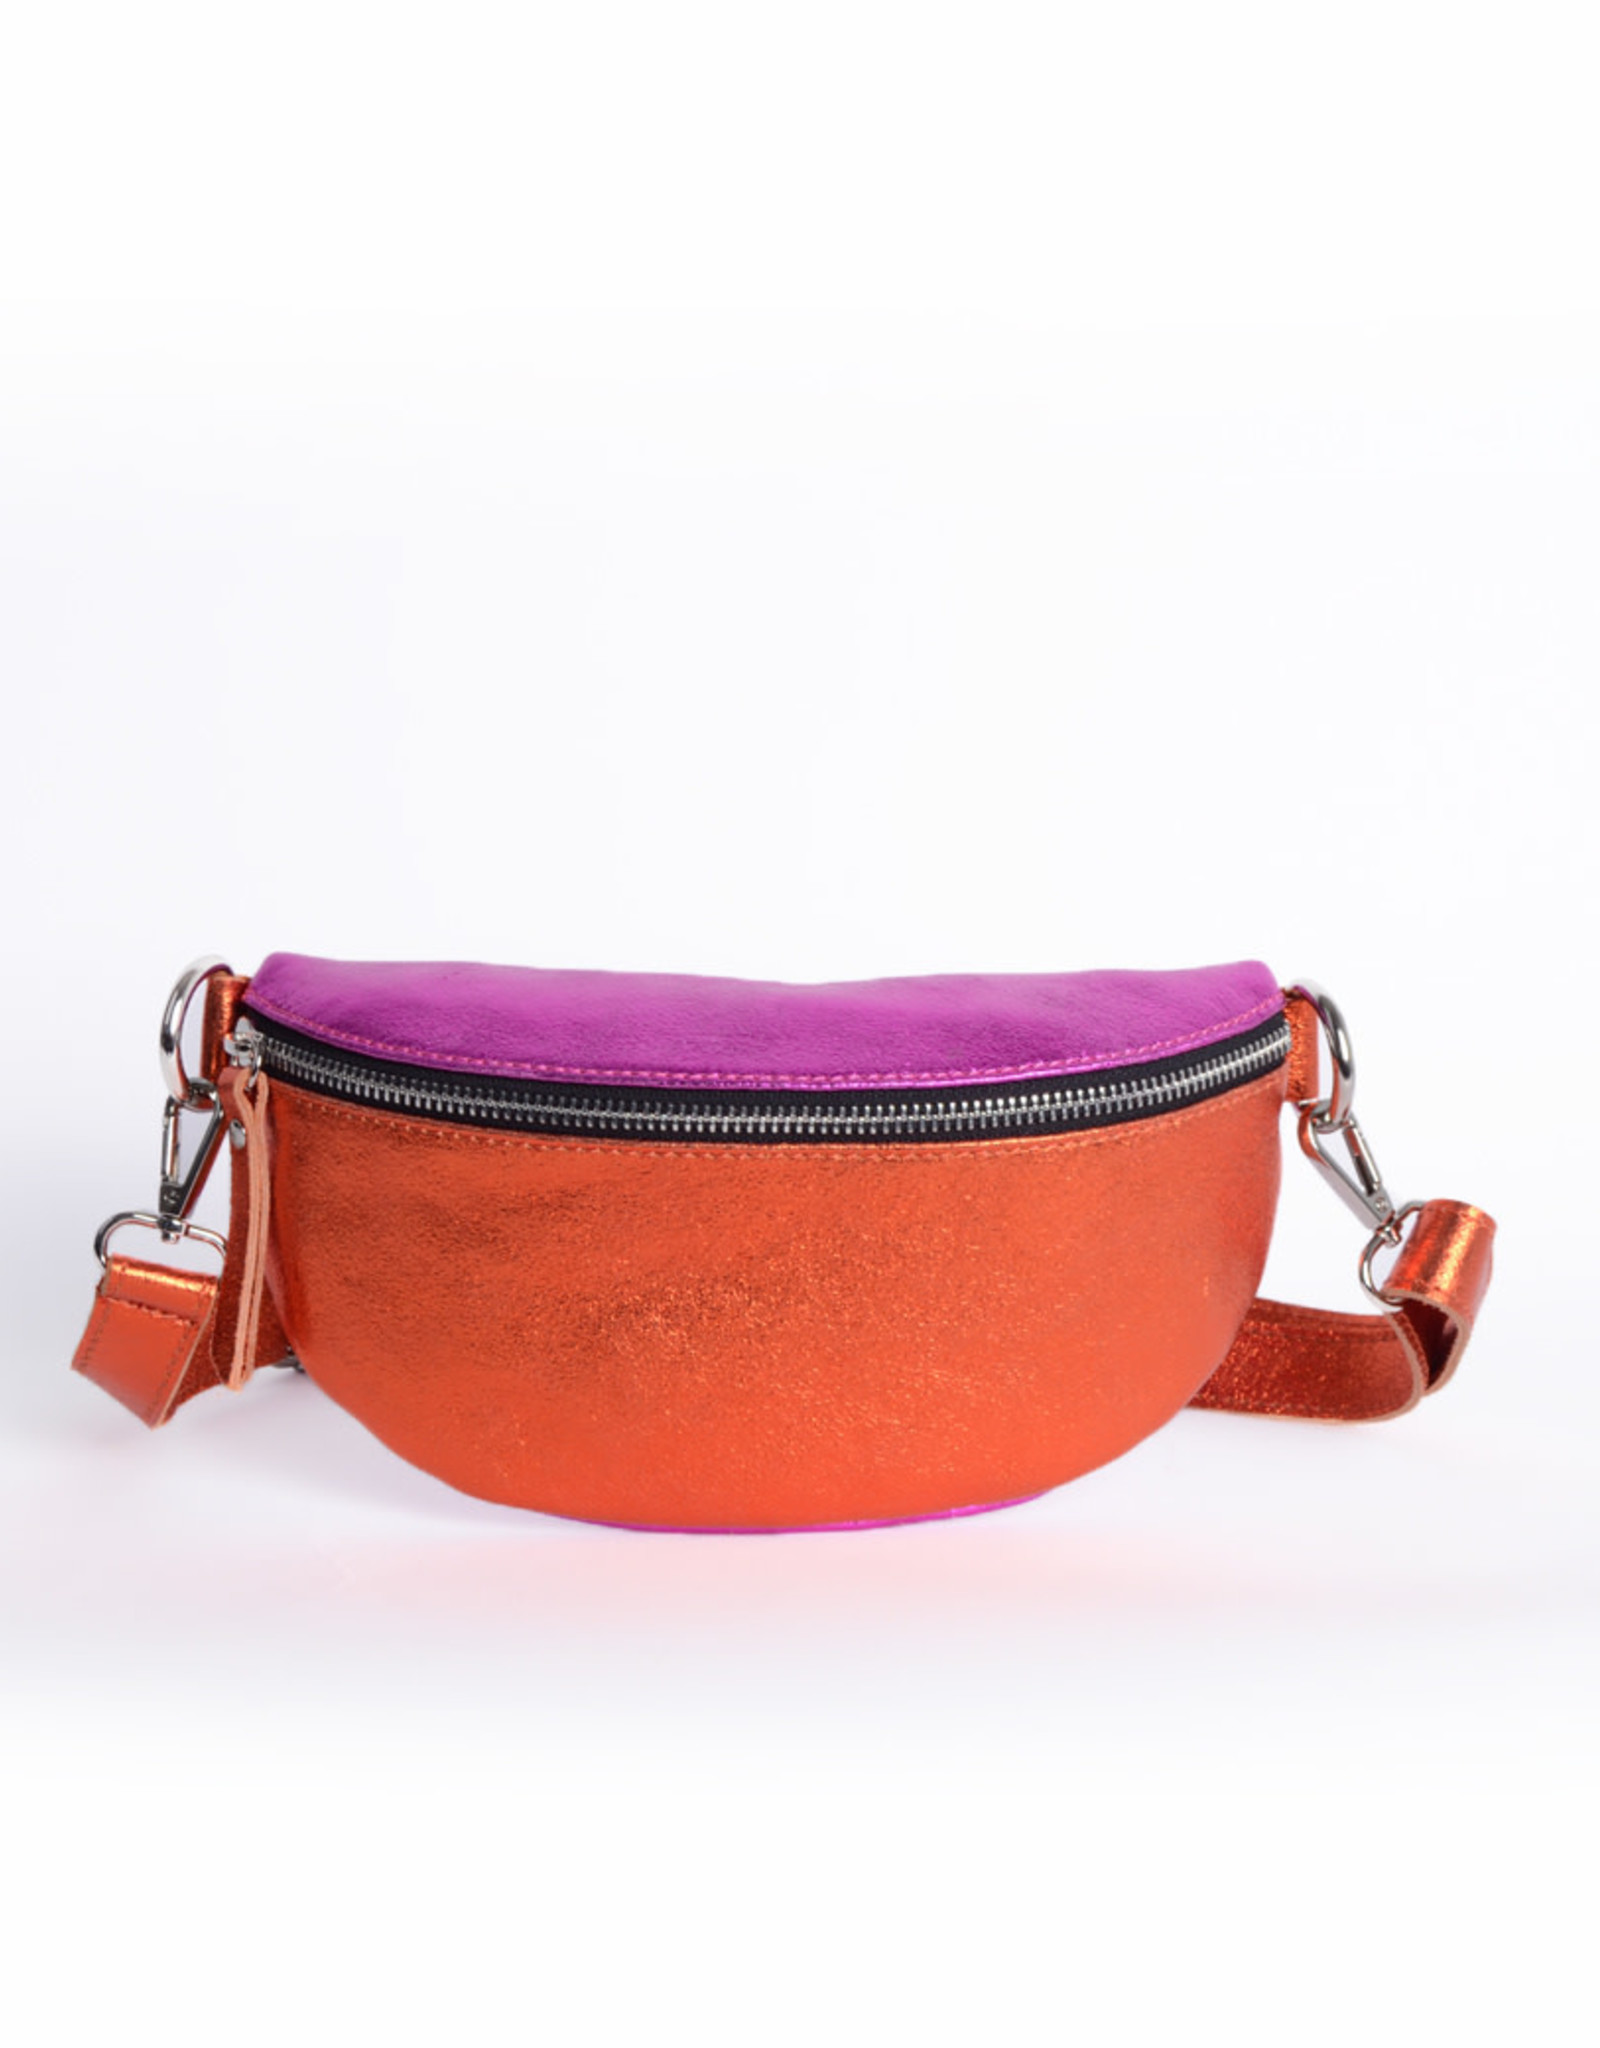 Leren Tas Tessa Metallic Oranje / Fuchsia